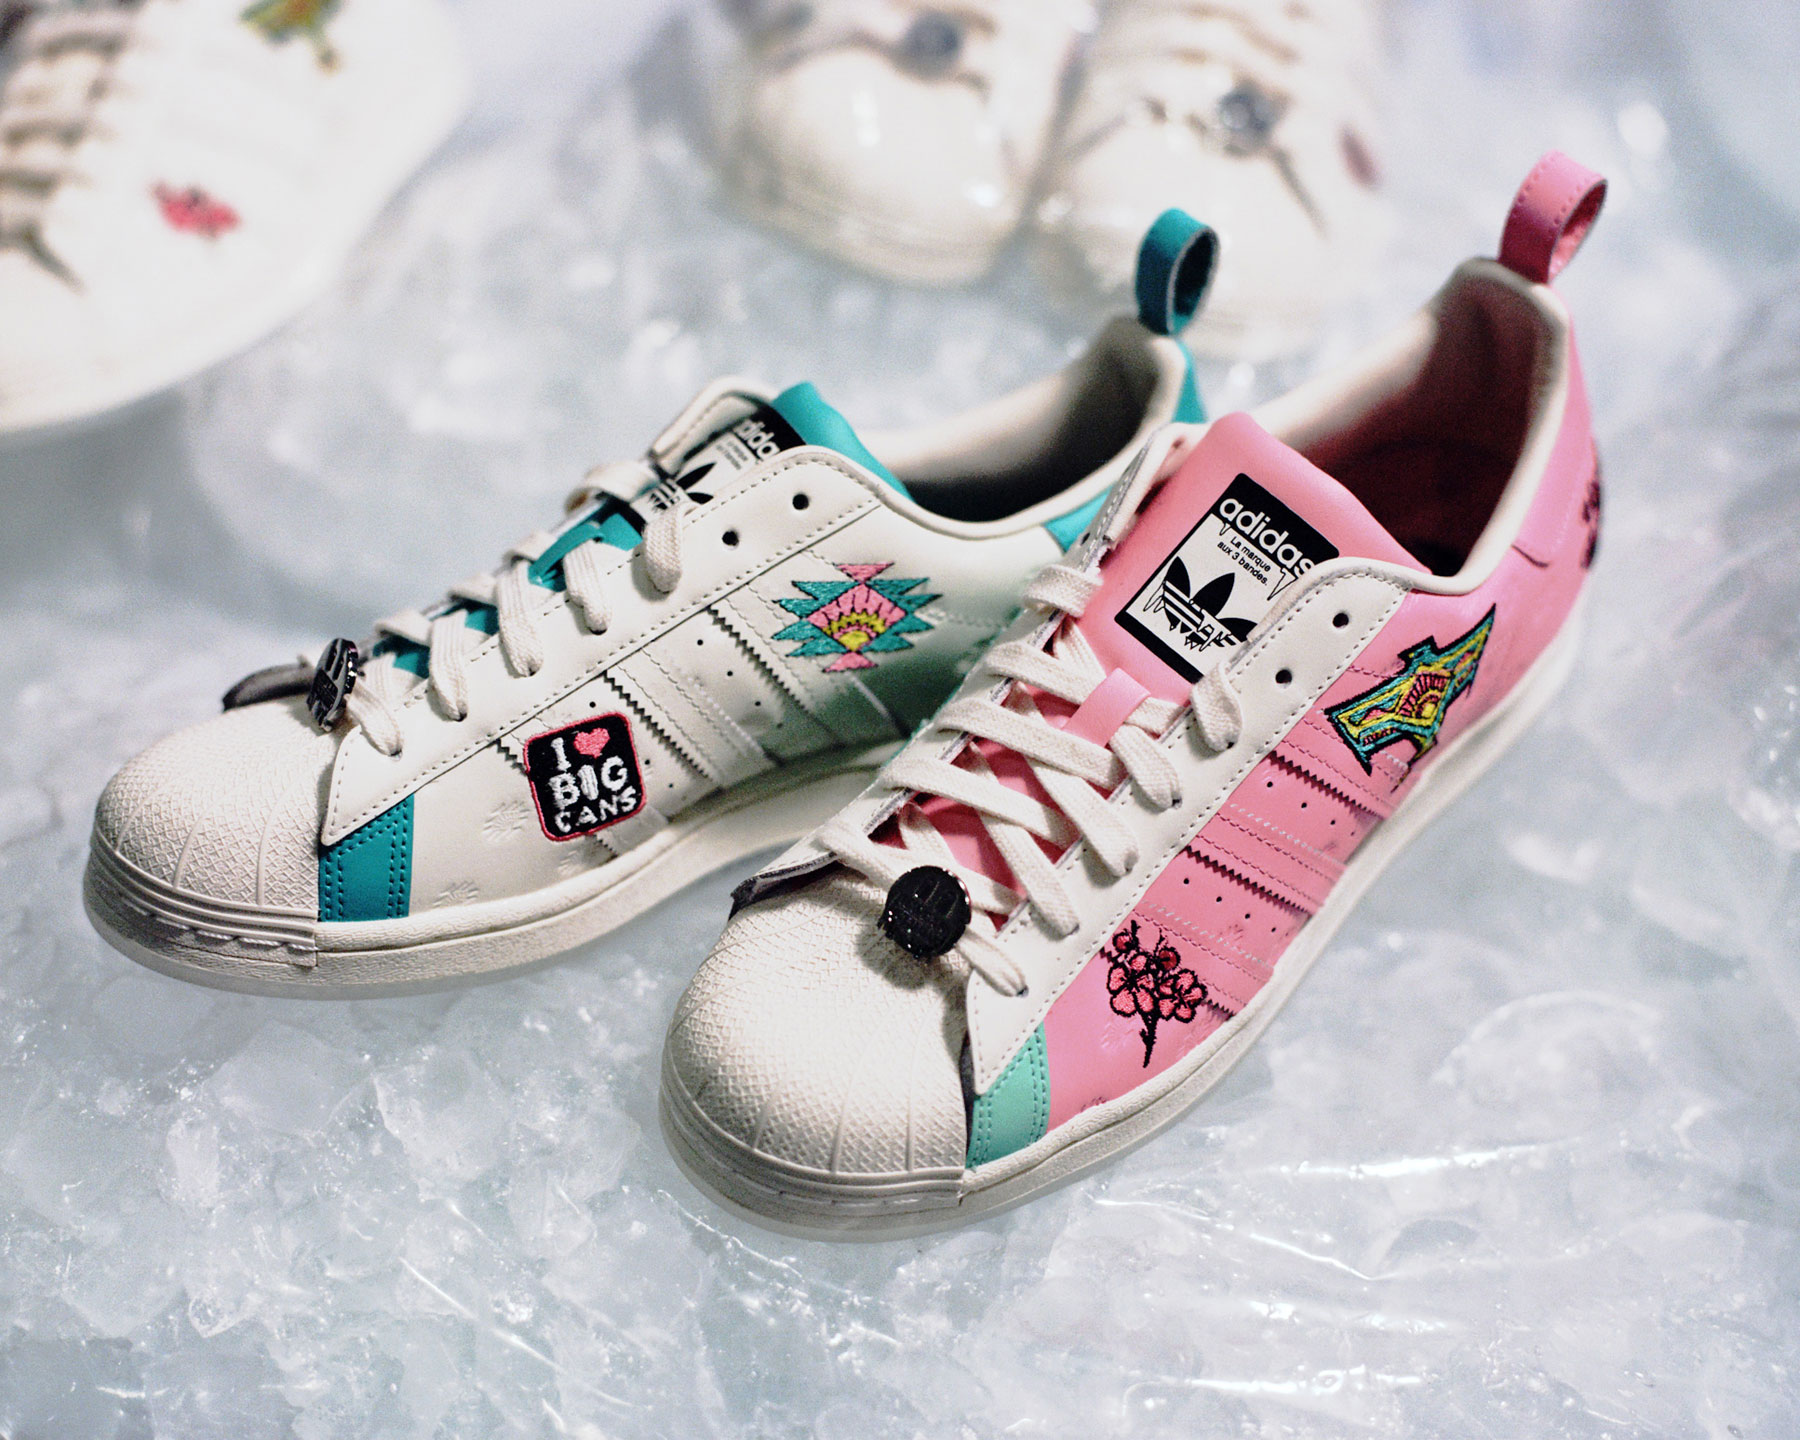 AriZona Iced Tea x adidas Originals collaboration